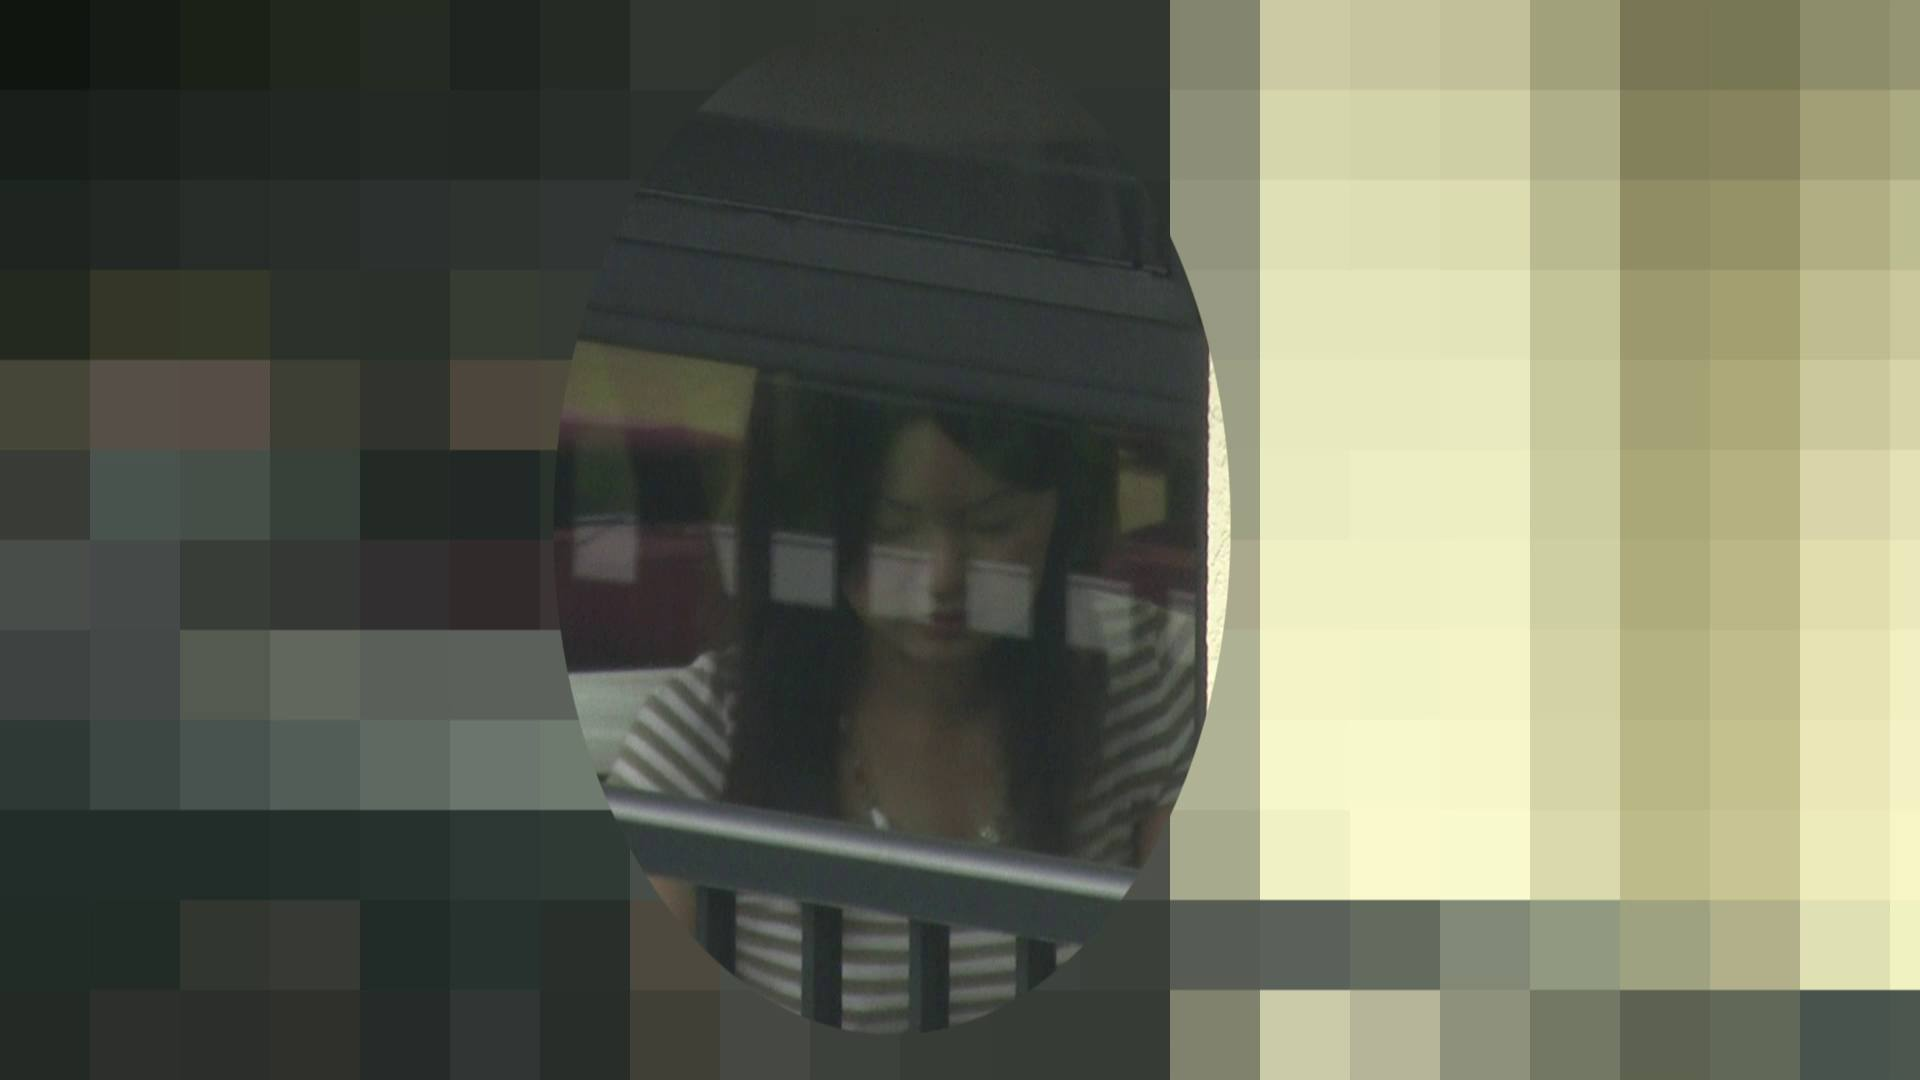 高画質露天女風呂観察 vol.032 乙女 えろ無修正画像 83pic 53